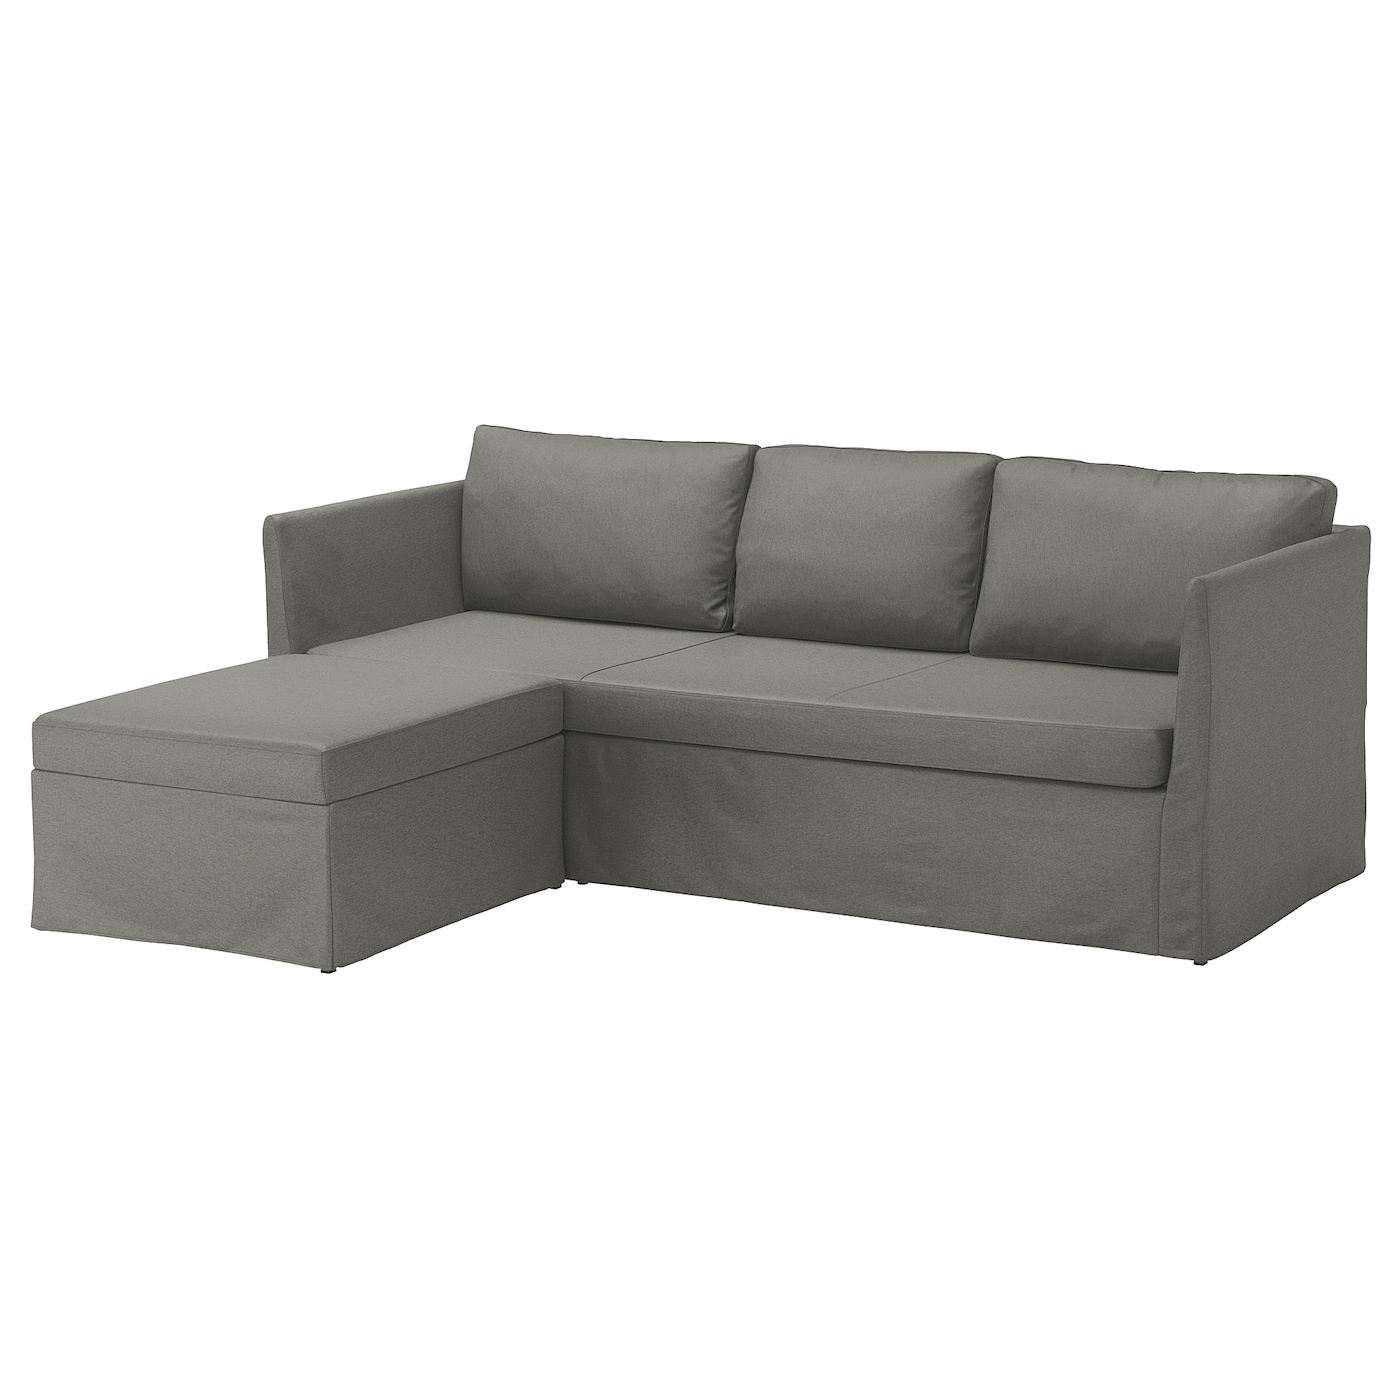 BrÅthult Borred Grey Green Corner Sofa